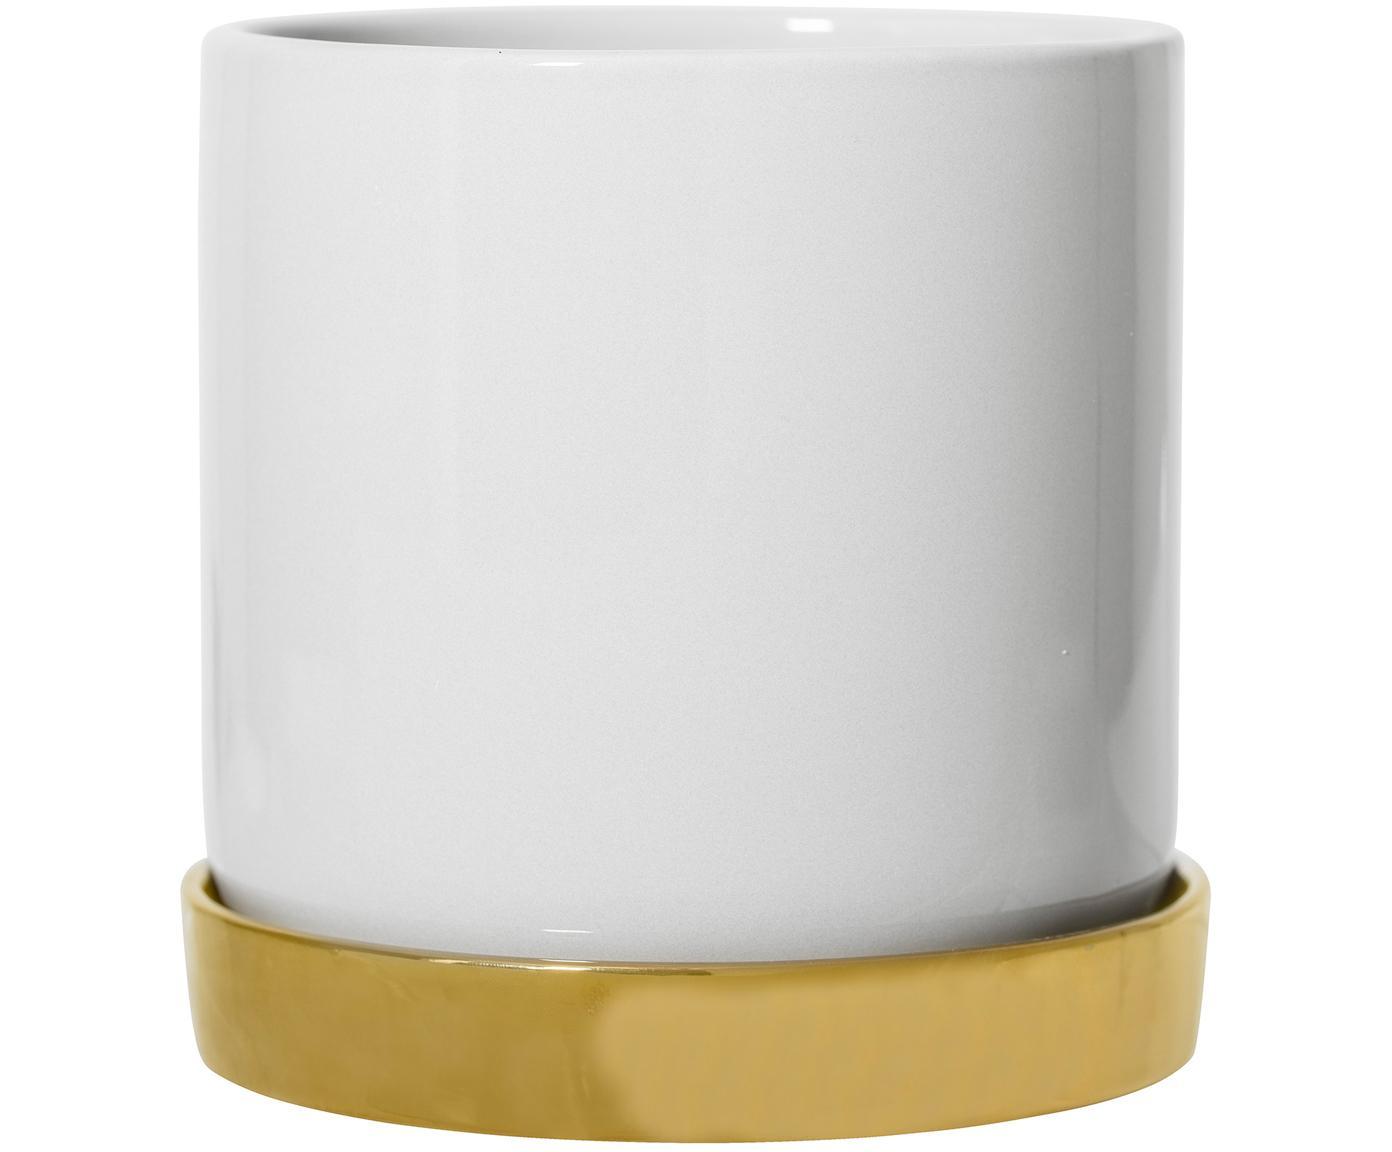 Plantenpot Elin, Keramiek, Pot: wit. Onderzetter: goudkleurig, Ø 14 x H 14 cm